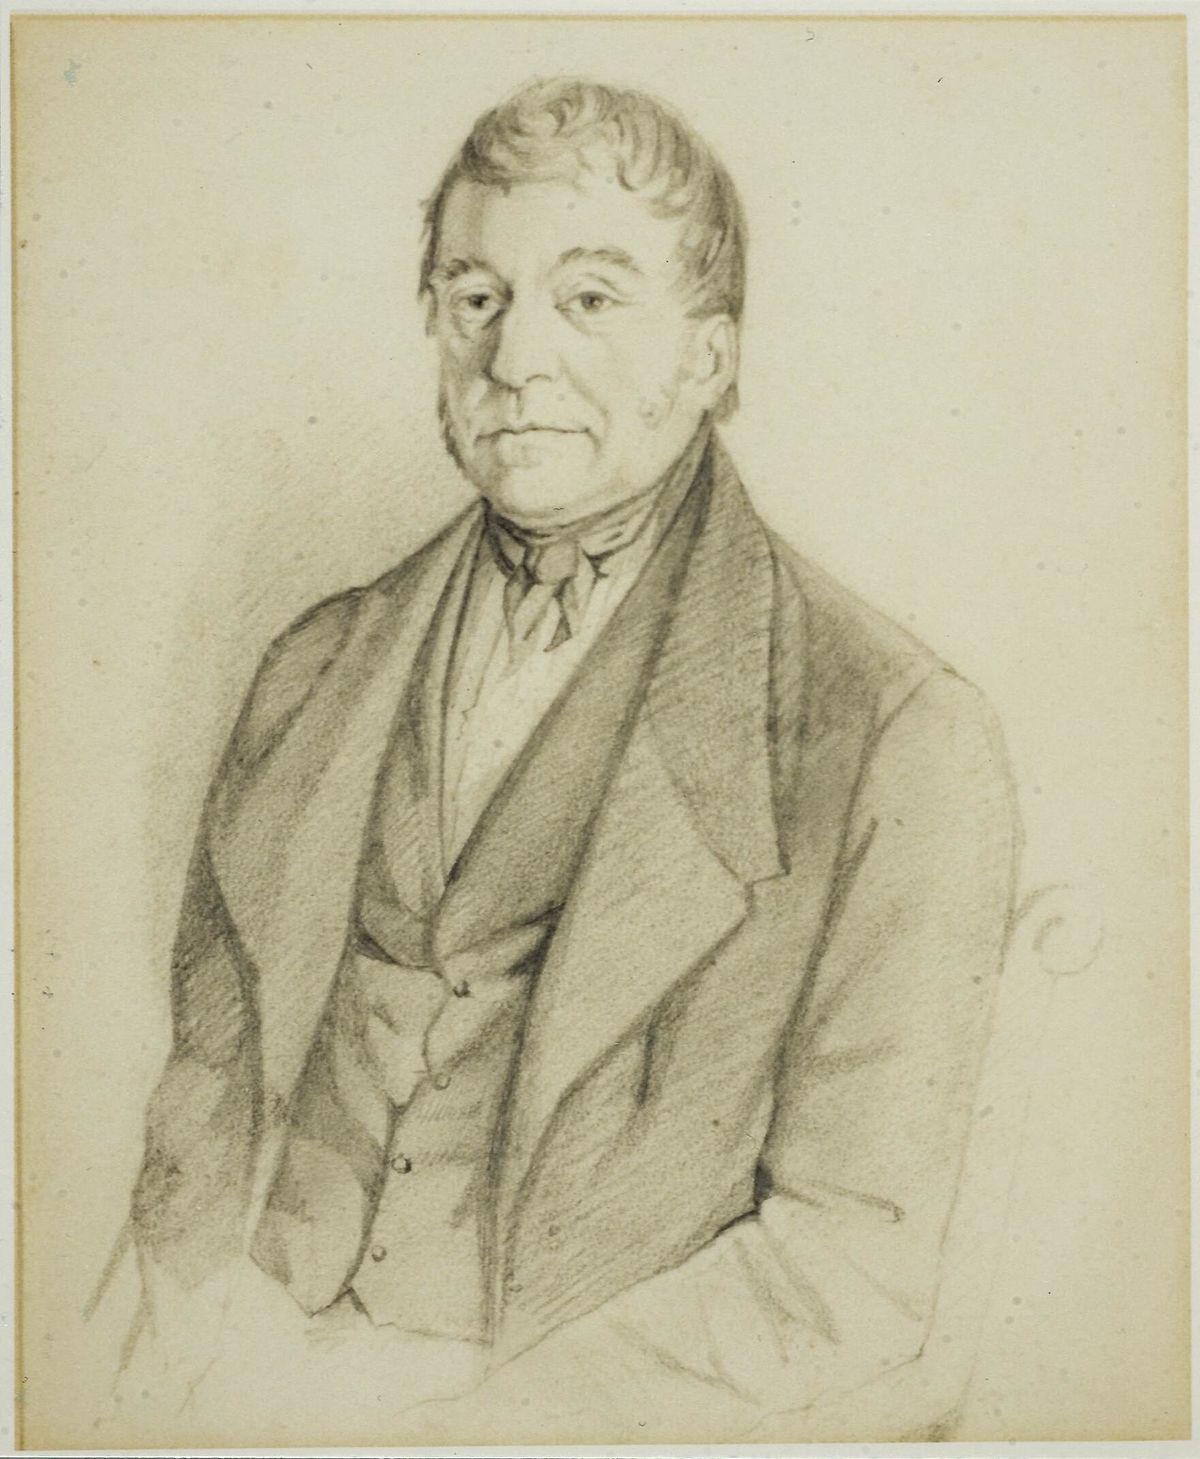 Pieter Abbeel Phd Thesis